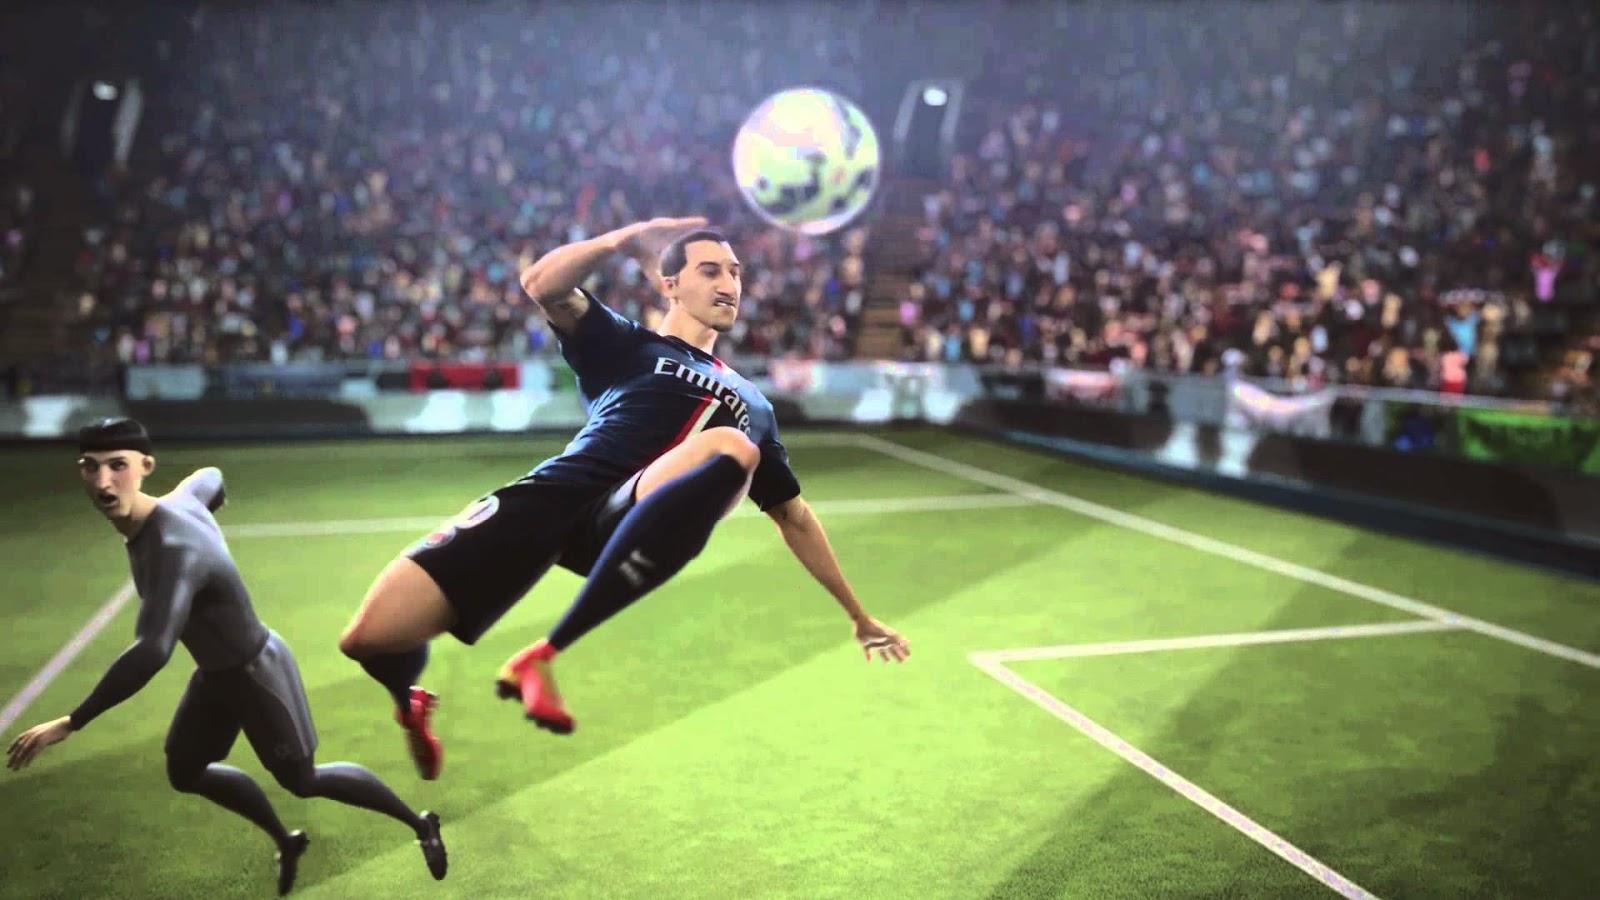 FootballOffThePitch: Ronaldo, Neymar, Rooney, Zlatan, Iniesta ...